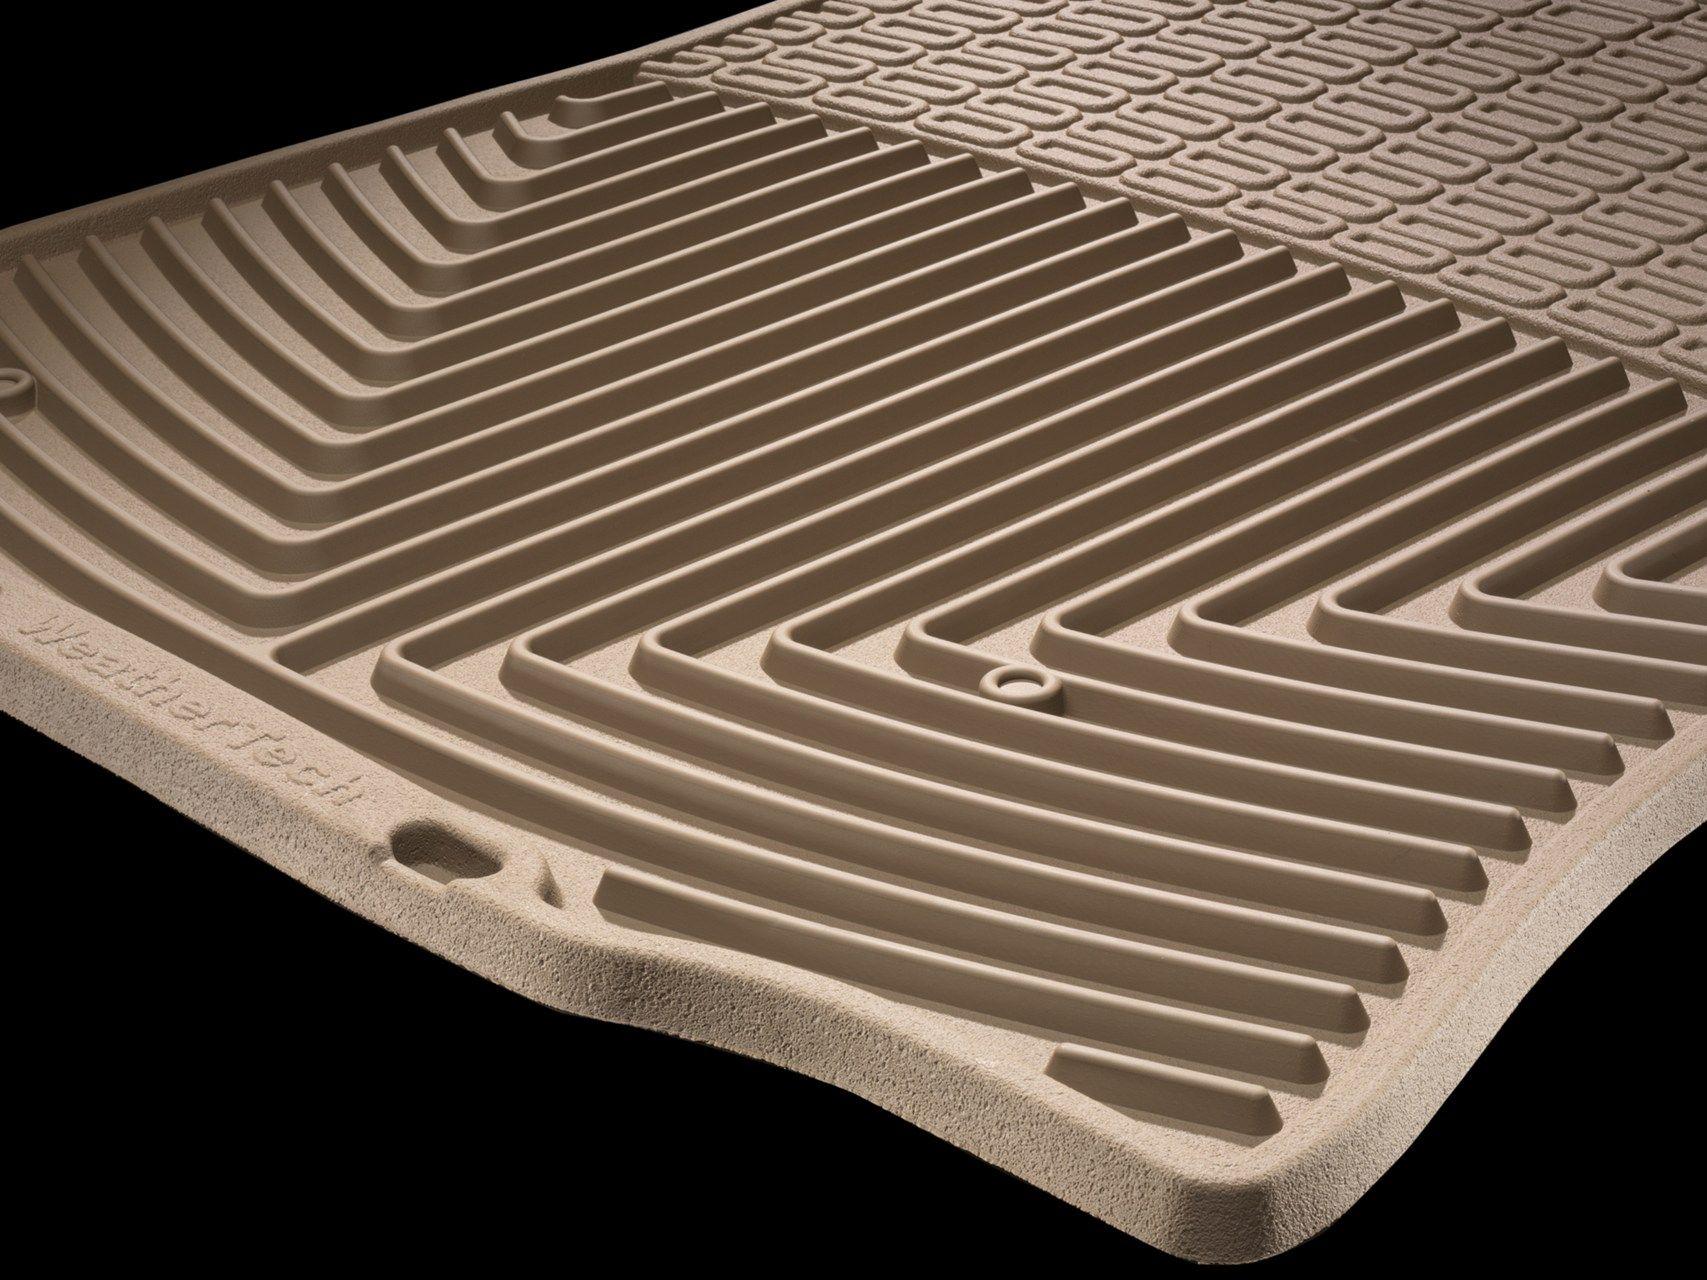 Weathertech floor mats 2013 kia sportage - Abarth Punto Evo 2010 Onward Car Mats Pinterest Evo Cars And Html